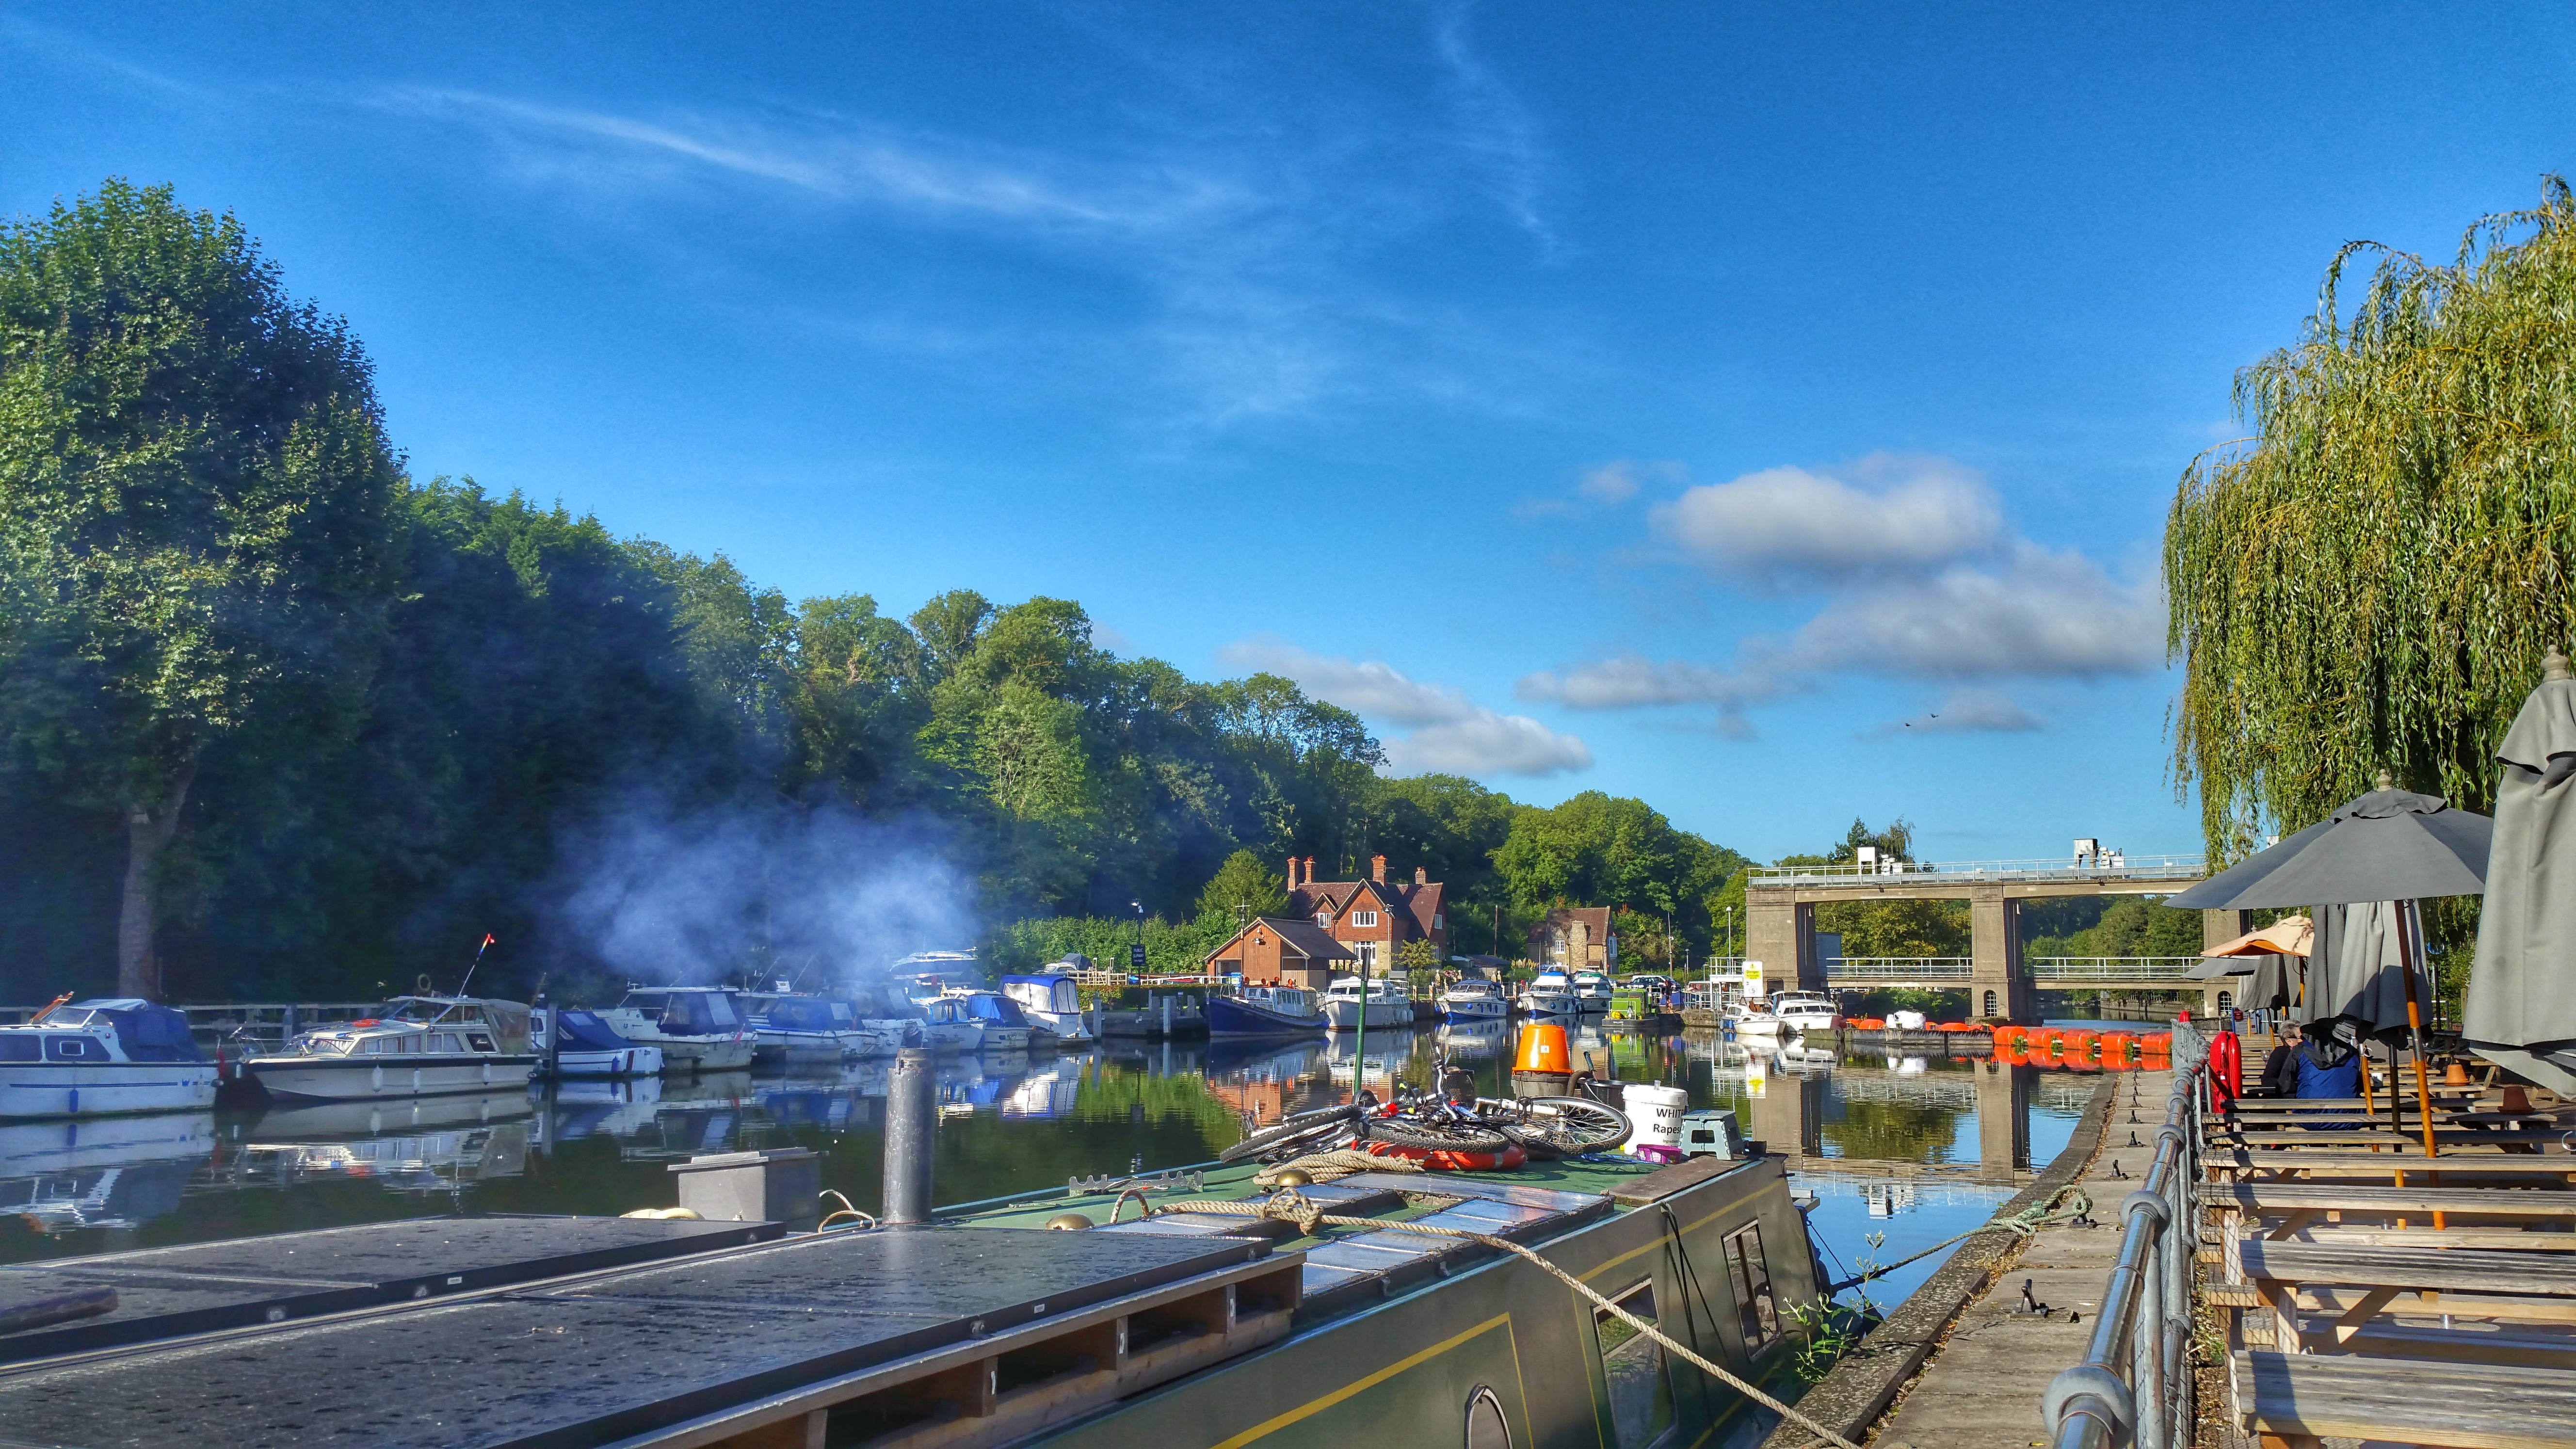 Premier Inn Sandling Maidstone Kent hotel information review canal boats river medway